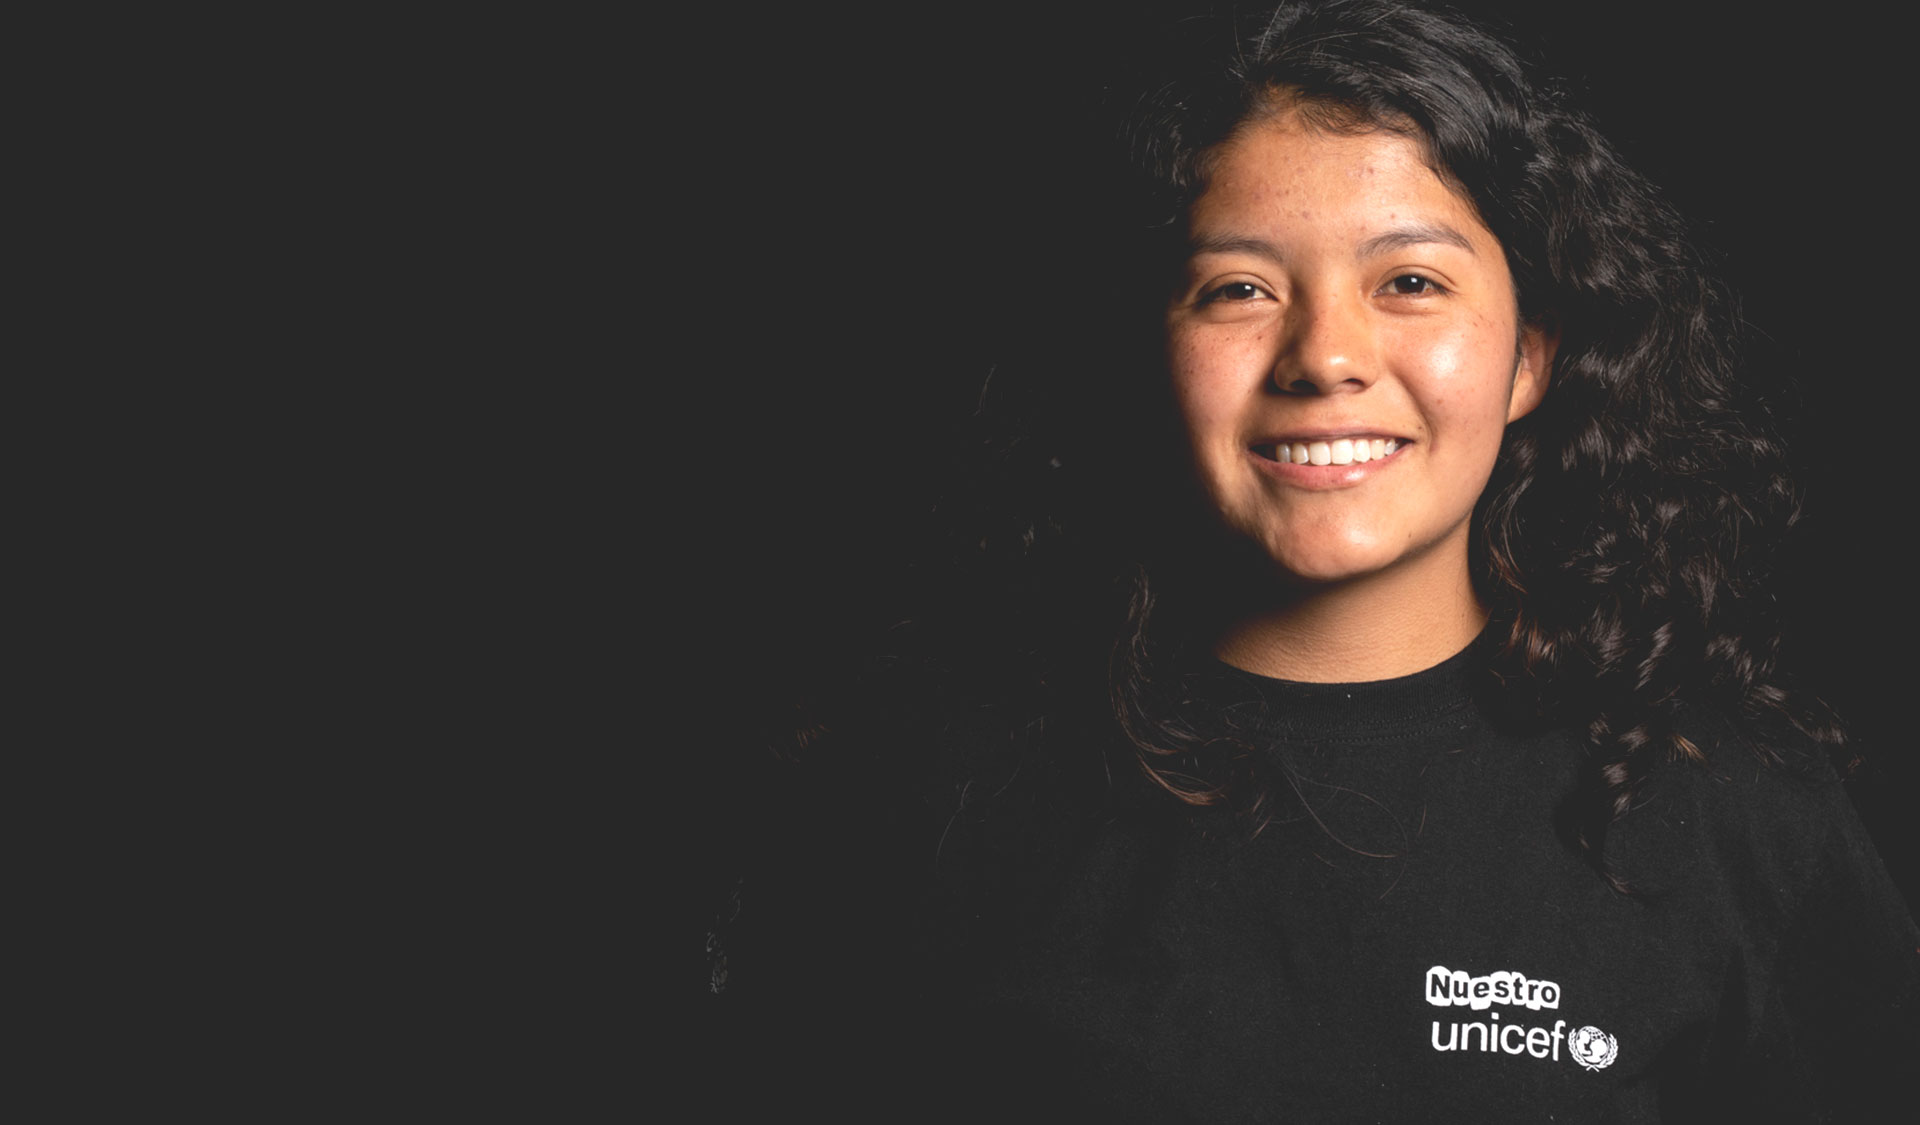 Ciberconscientes UNICEF & Tigo CiberConscientes es una content hub que nace de La Escuela De